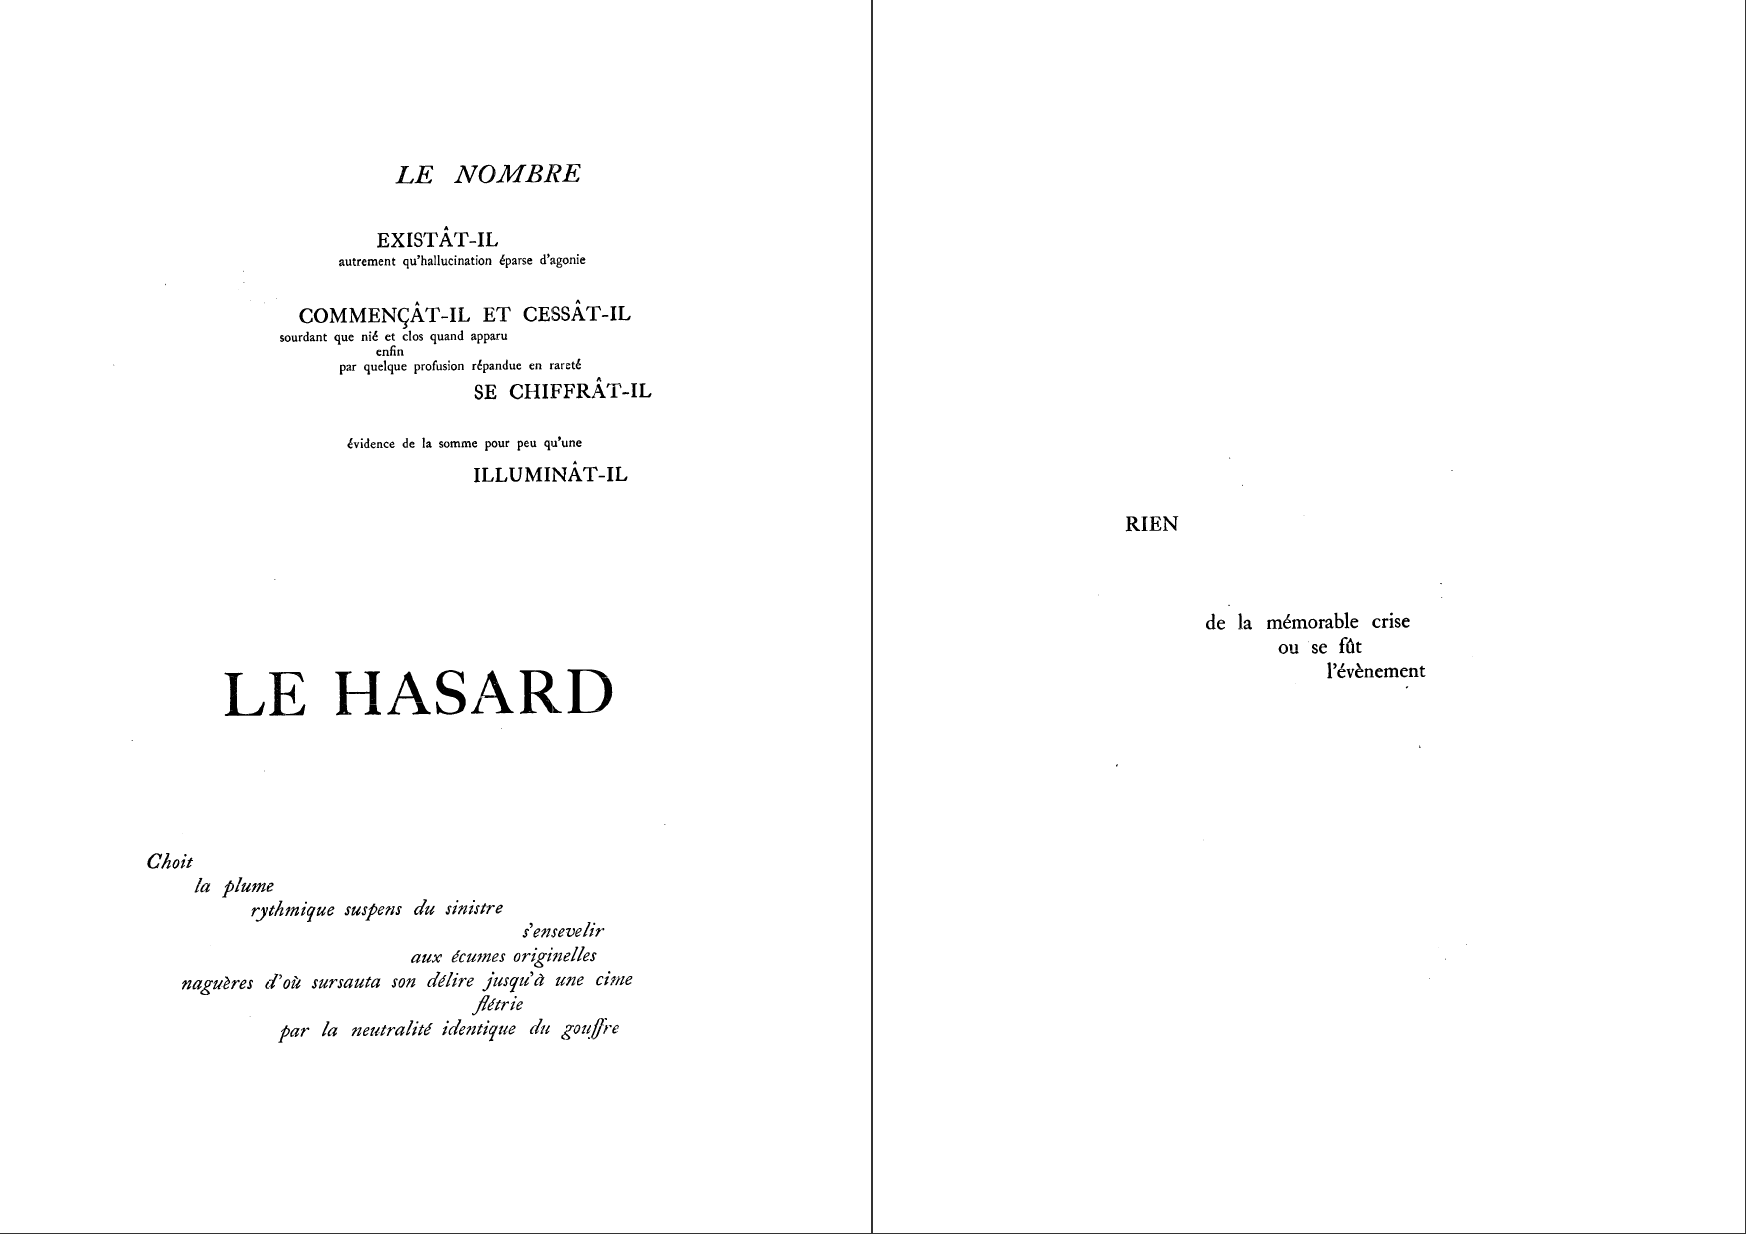 Hasard.png